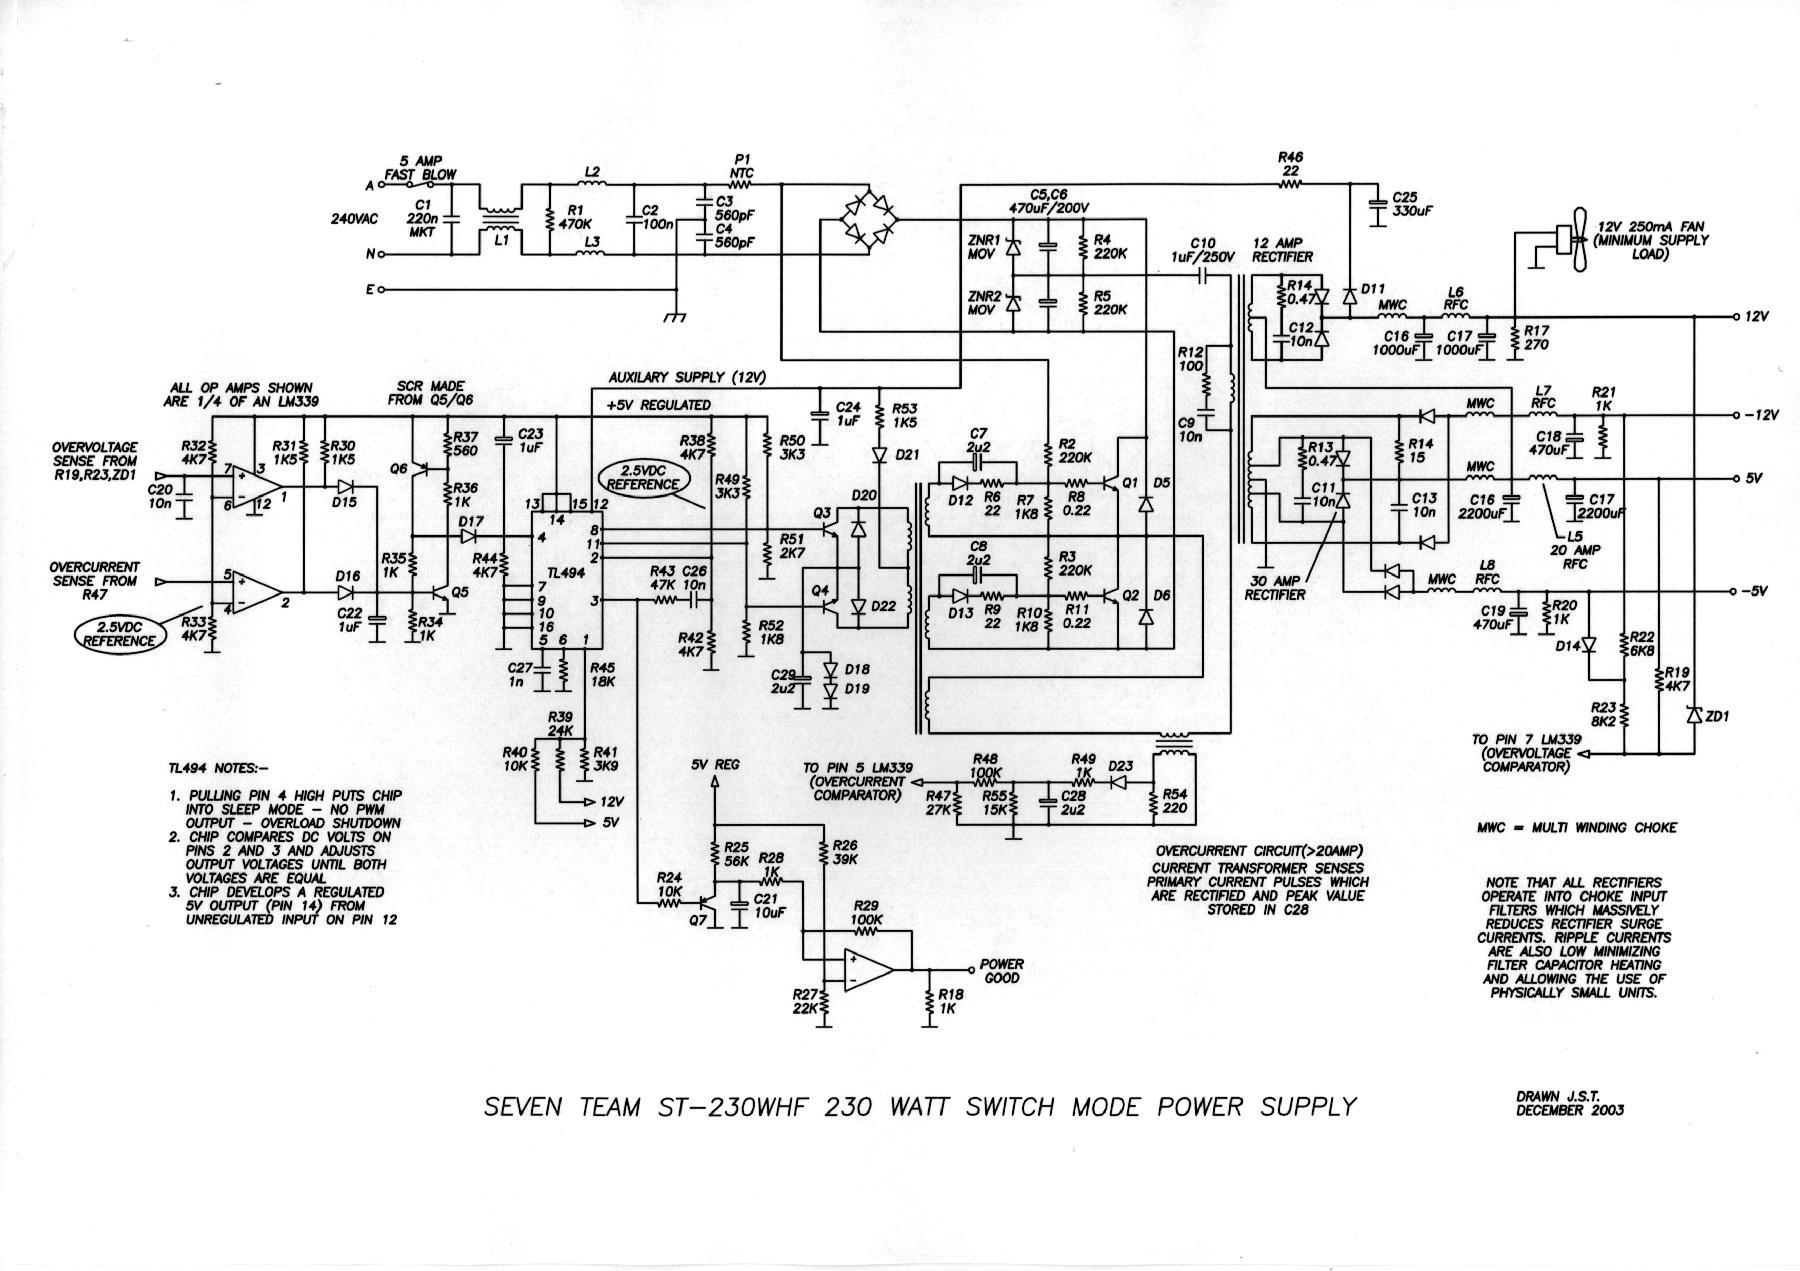 Surprising Power Switching Power Supply Powersupplycircuit Circuit Diagram Wiring Cloud Onicaxeromohammedshrineorg